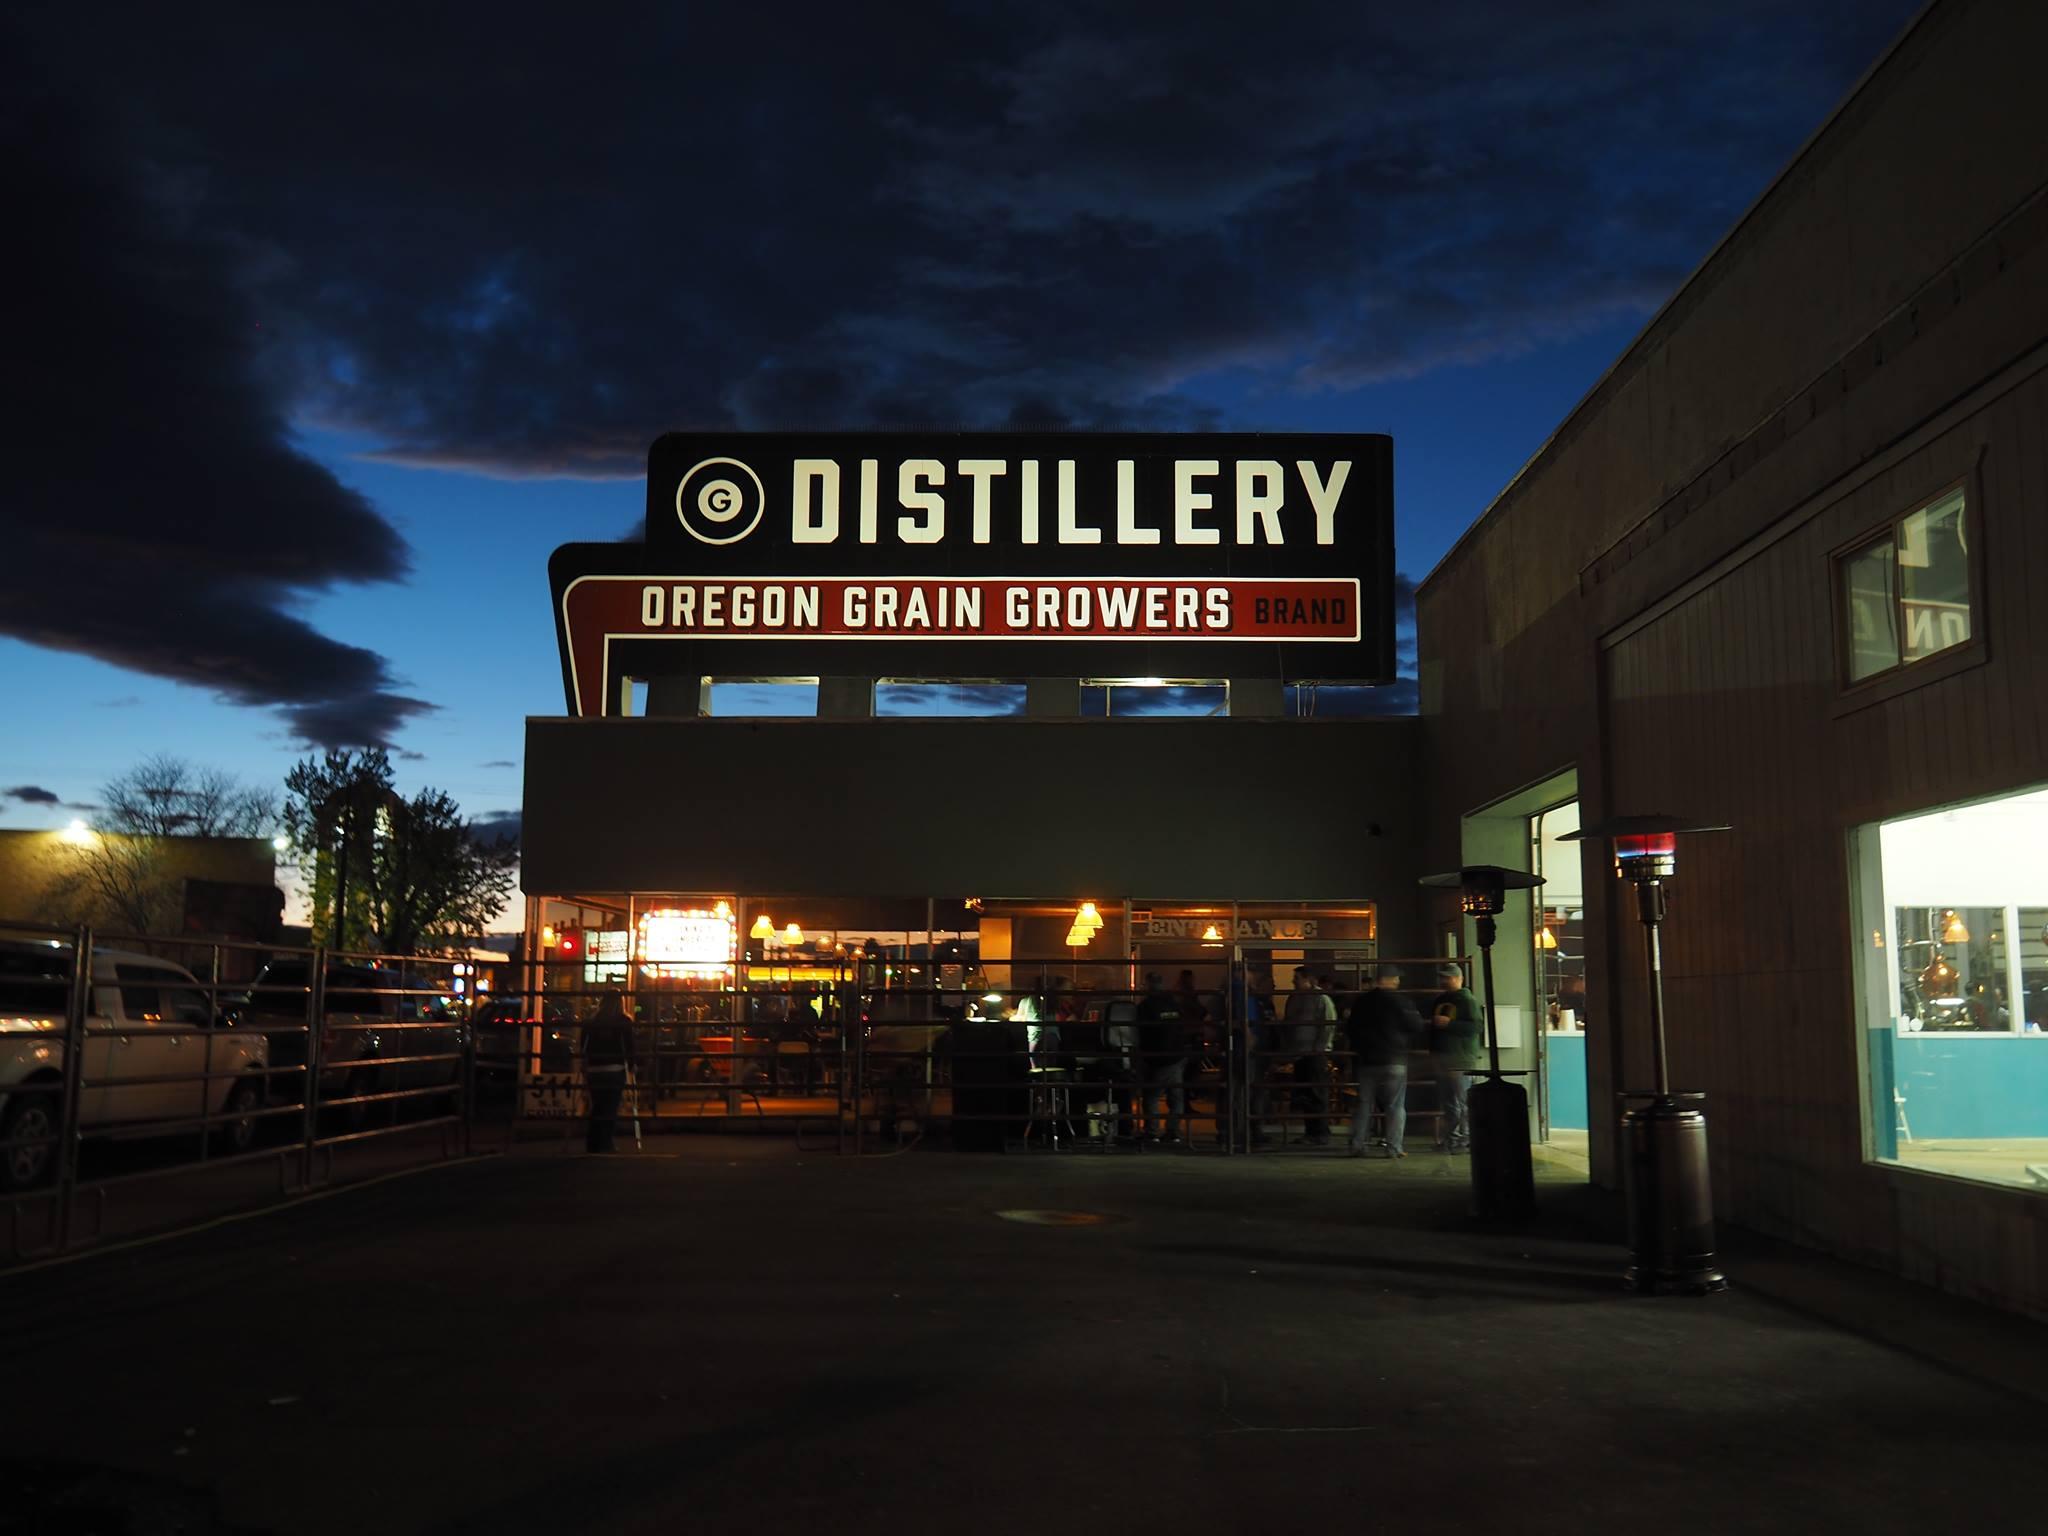 Oregon Grain Growers Brand Distillery Exterior